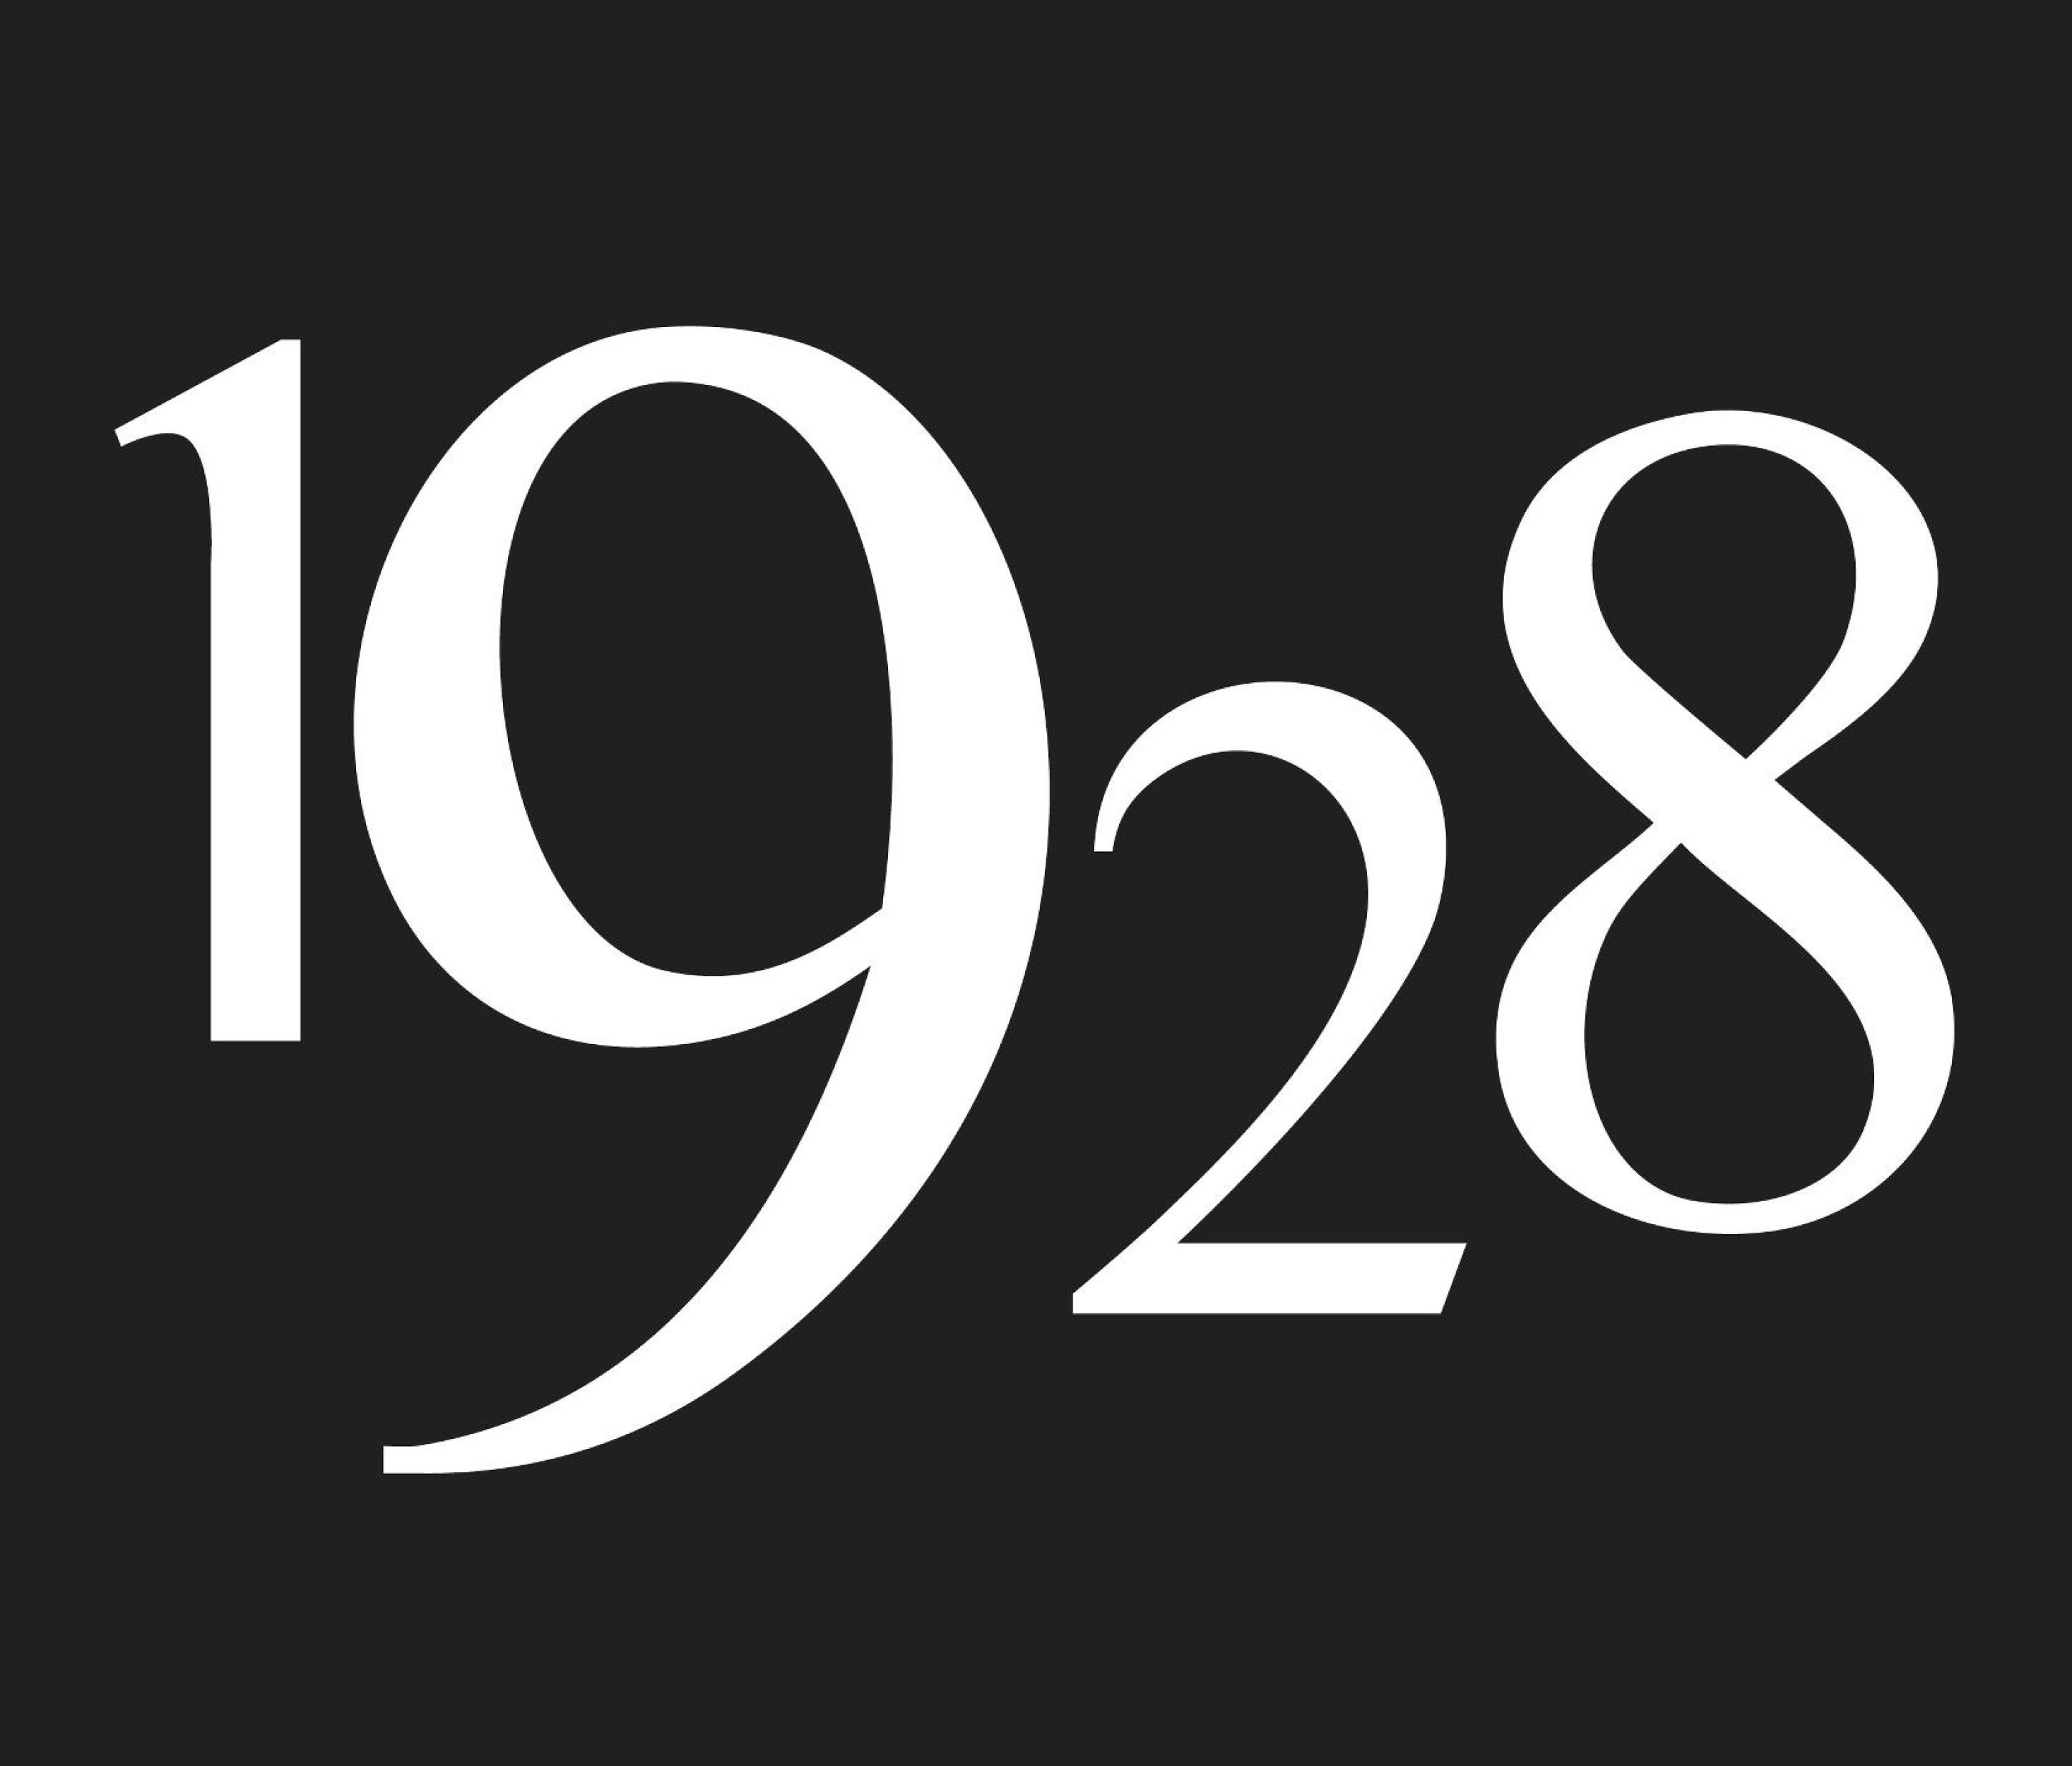 CAFE 1928